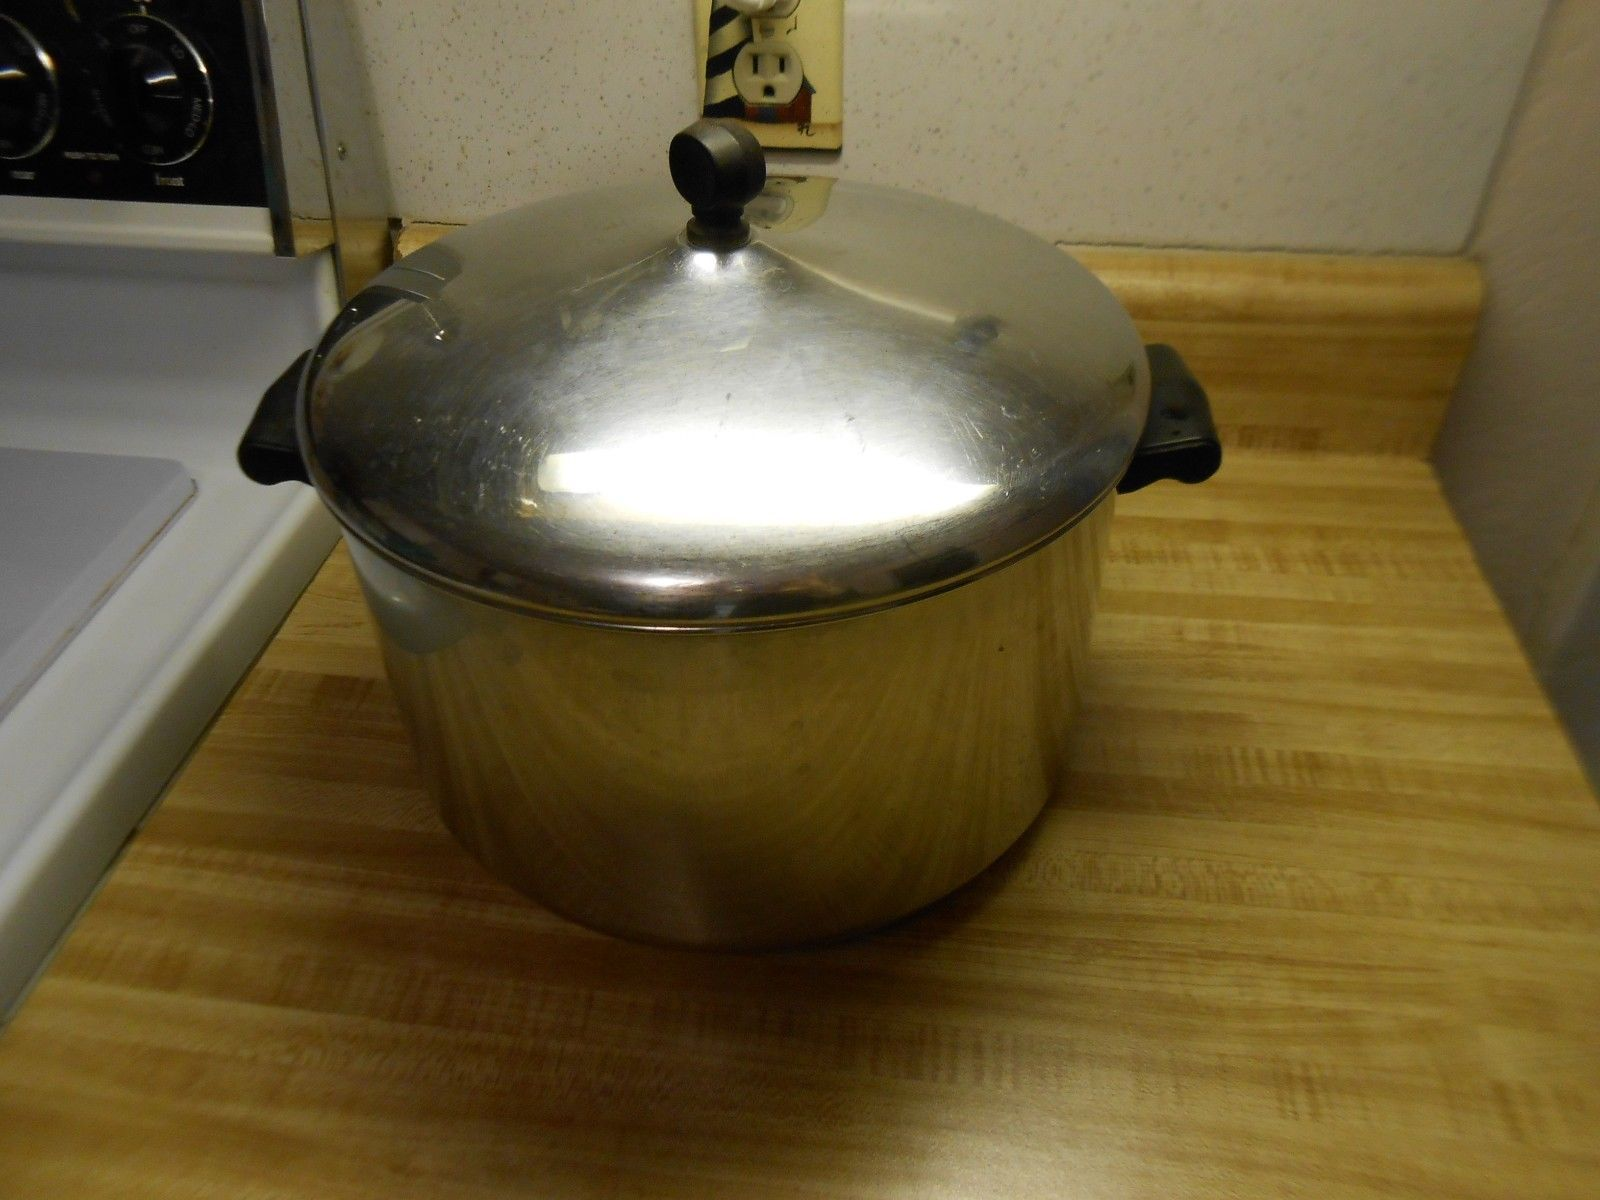 farberware pot Large farberware stock pot older style, holds 8 qts - $28.45